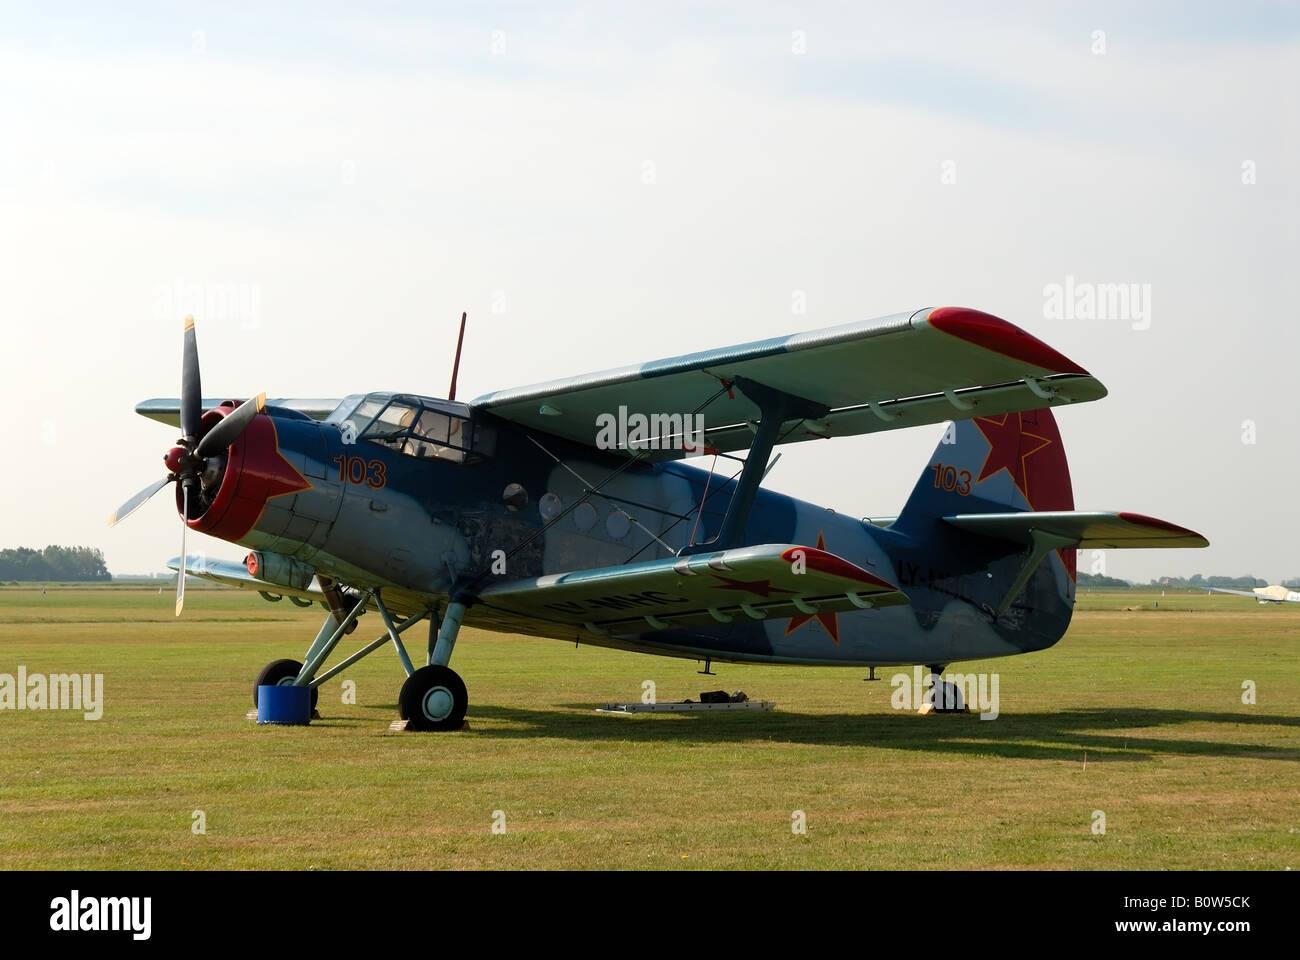 Historical airplane Antonov An-2 - Stock Image